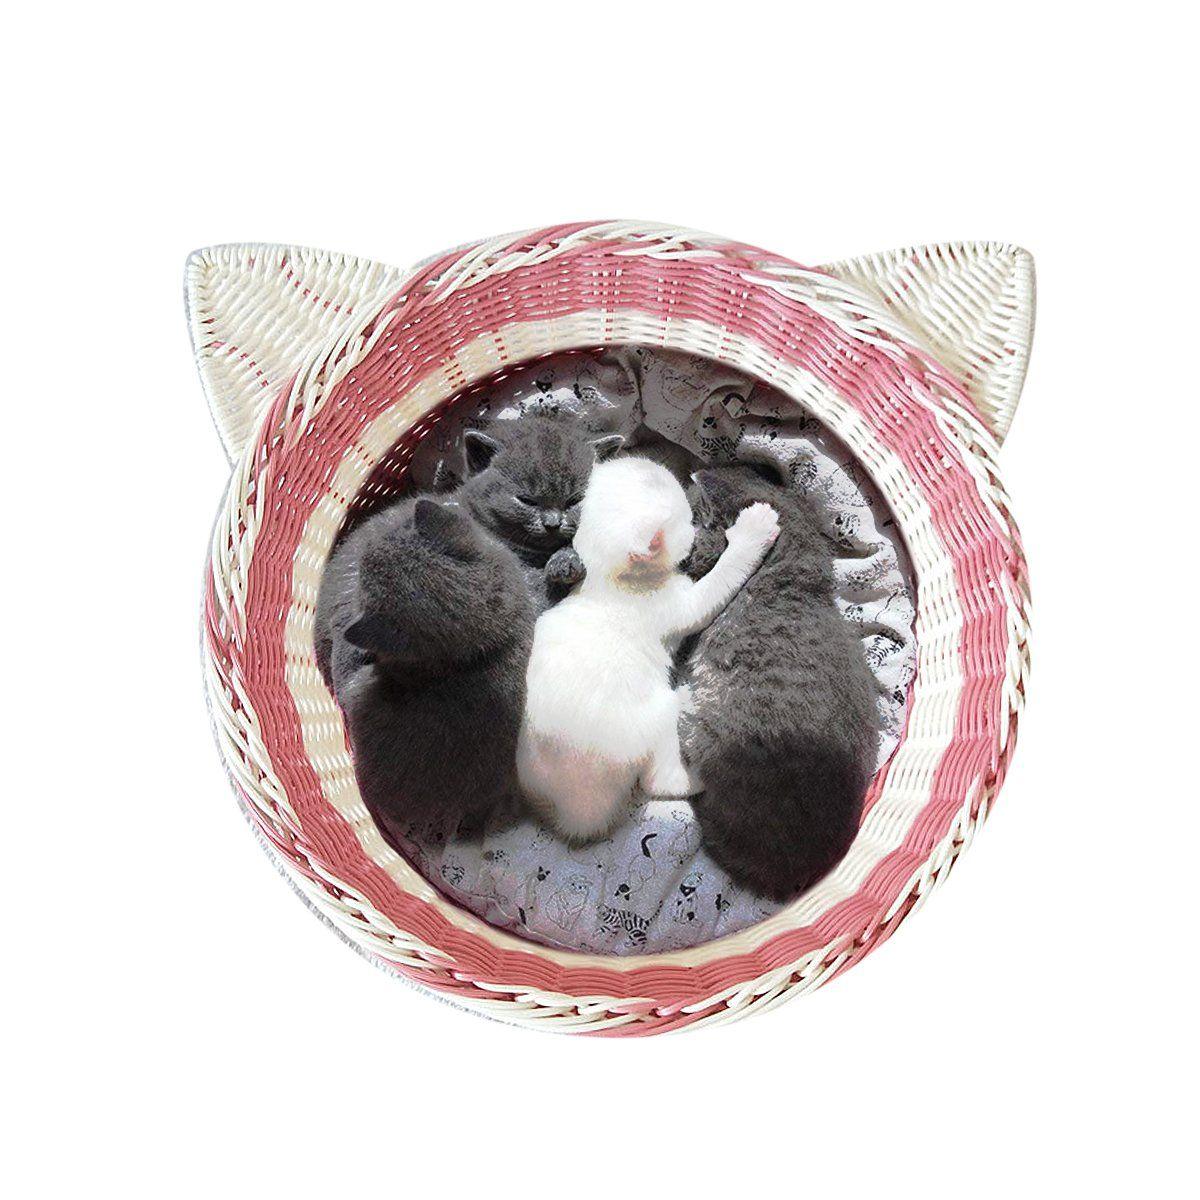 Amakunft Catshaped Imitation Rattan Cat Bed Washable Vine